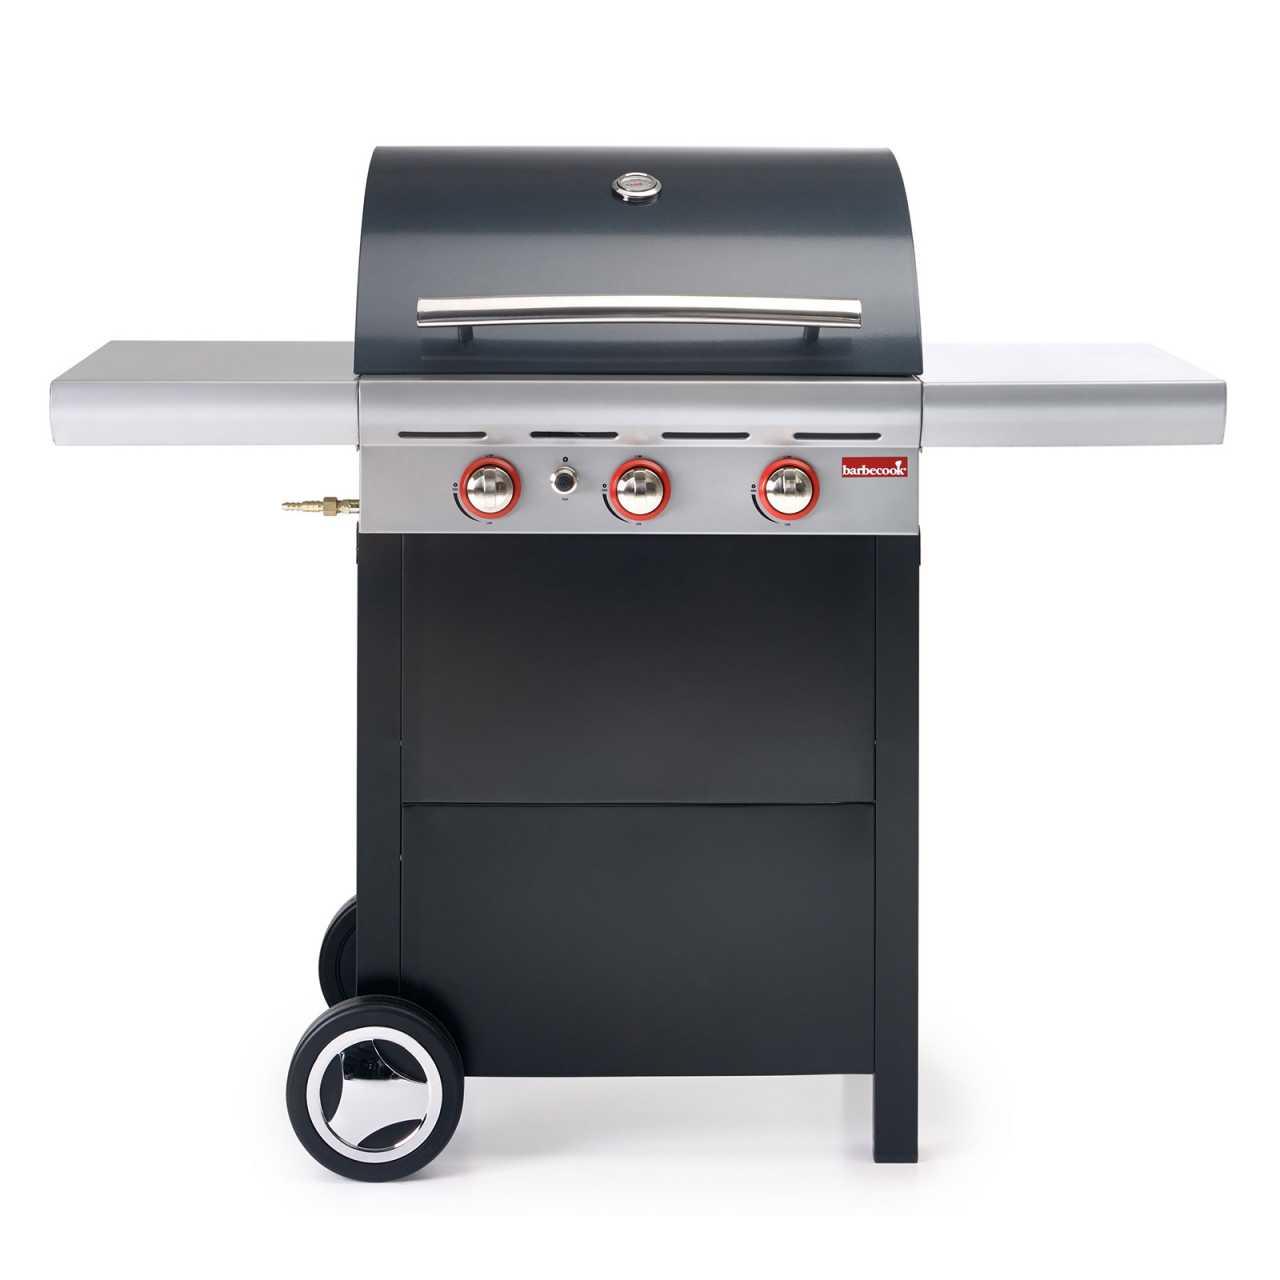 Barbecook Gasgrill Spring 300 anthrazit BBQ Grillwagen 11,4kW